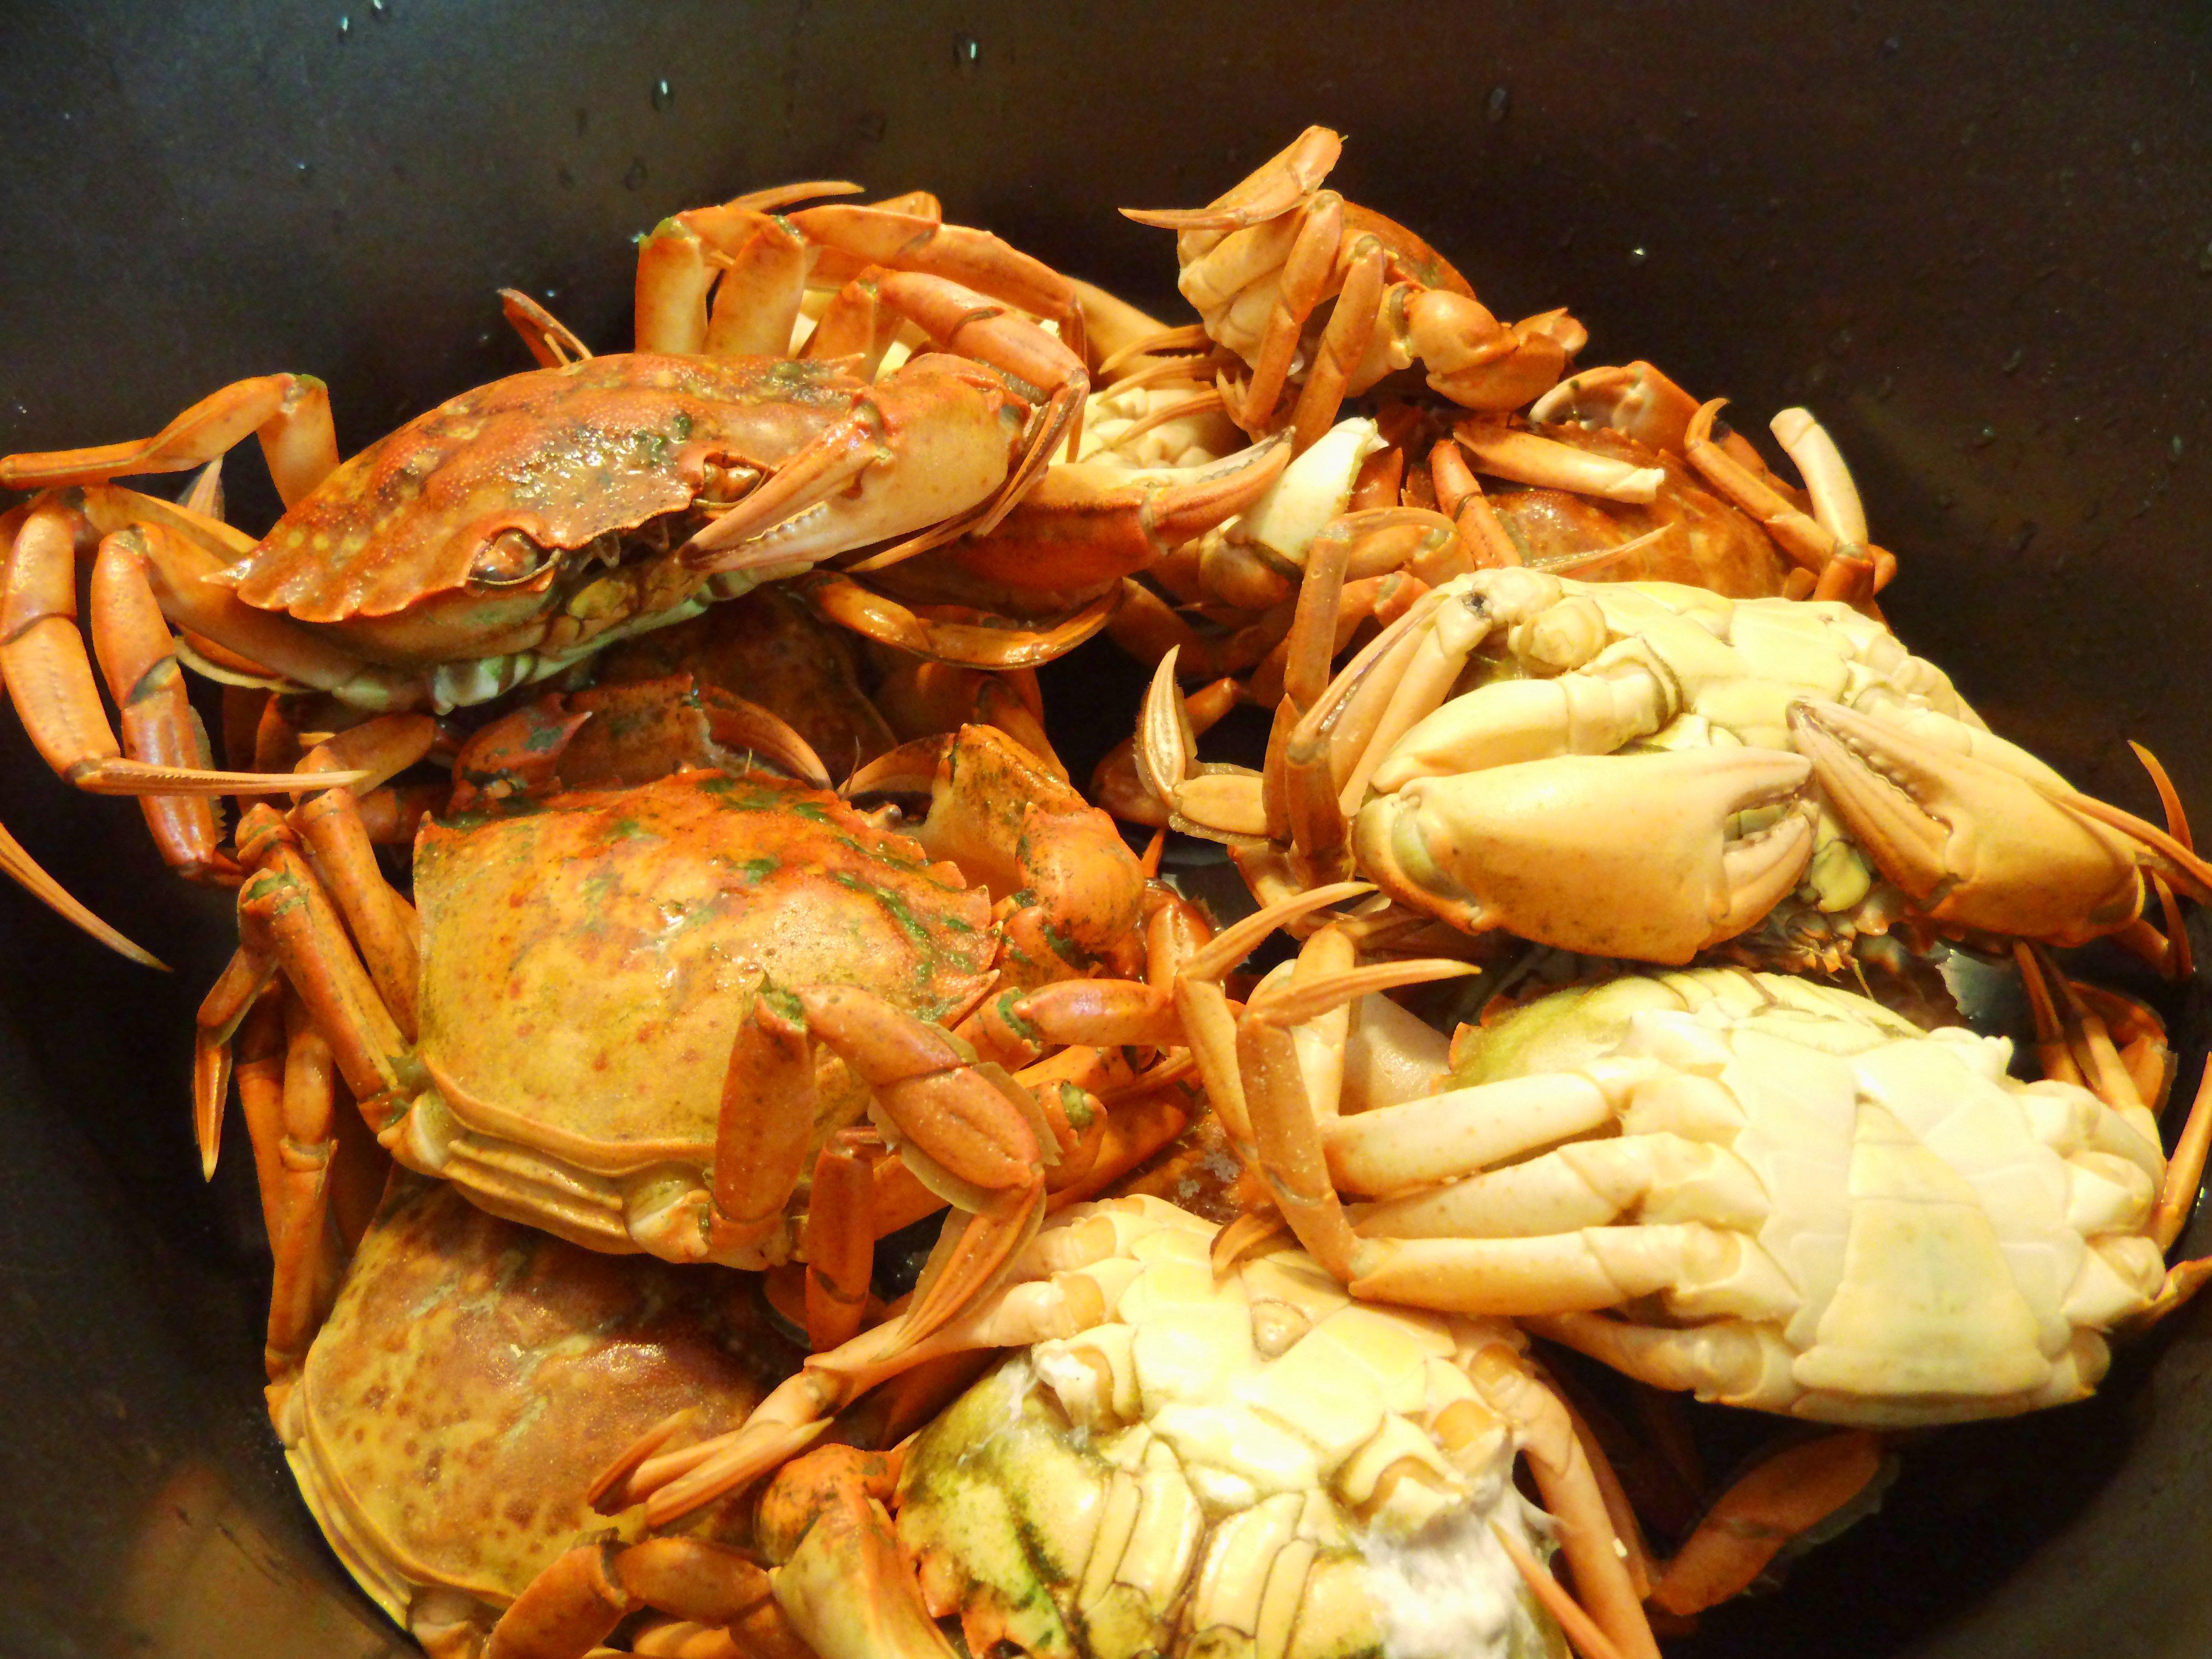 koge krabber